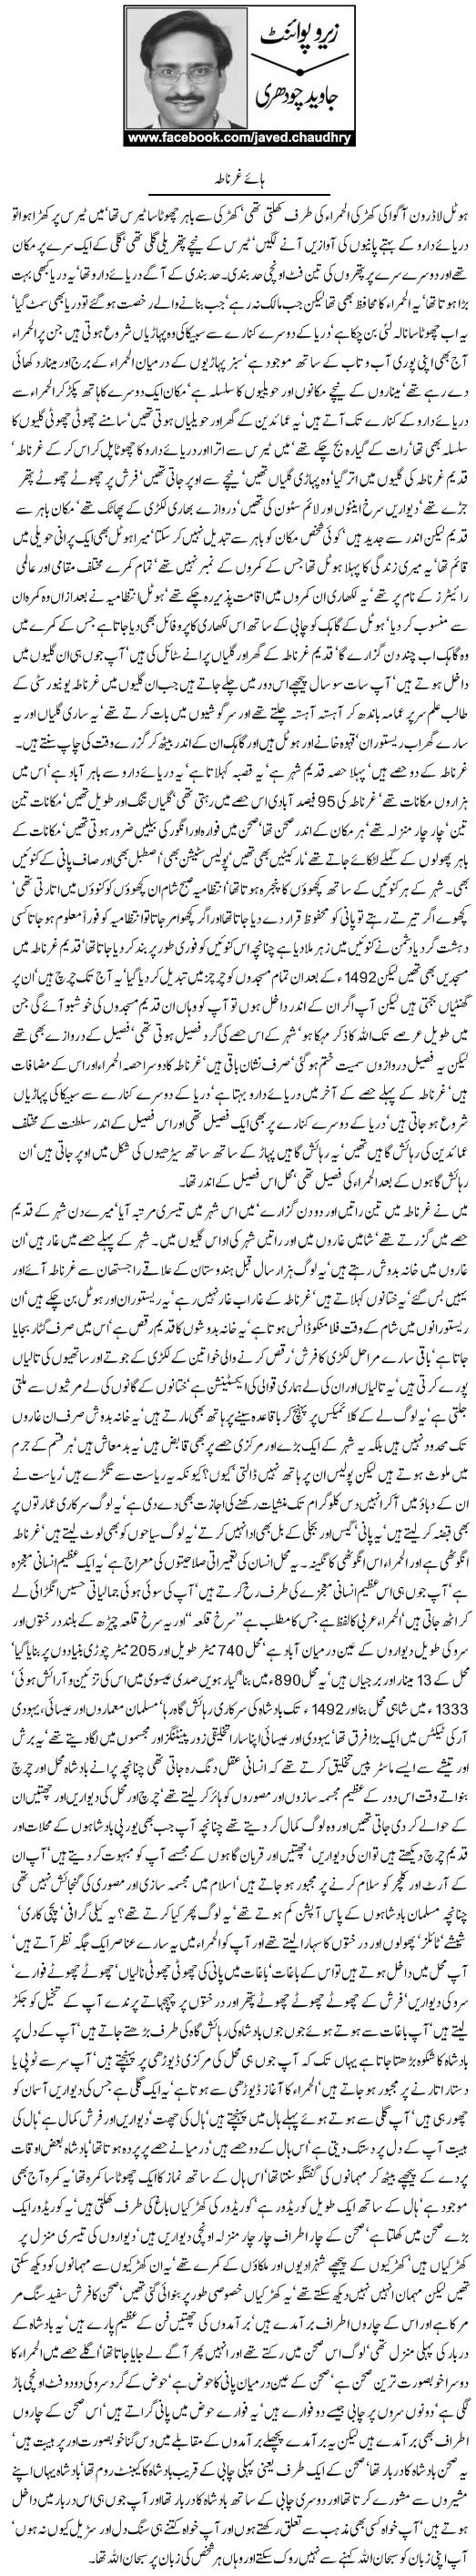 Javed Chaudhry Column | Haye Ghernatah | Zero Point